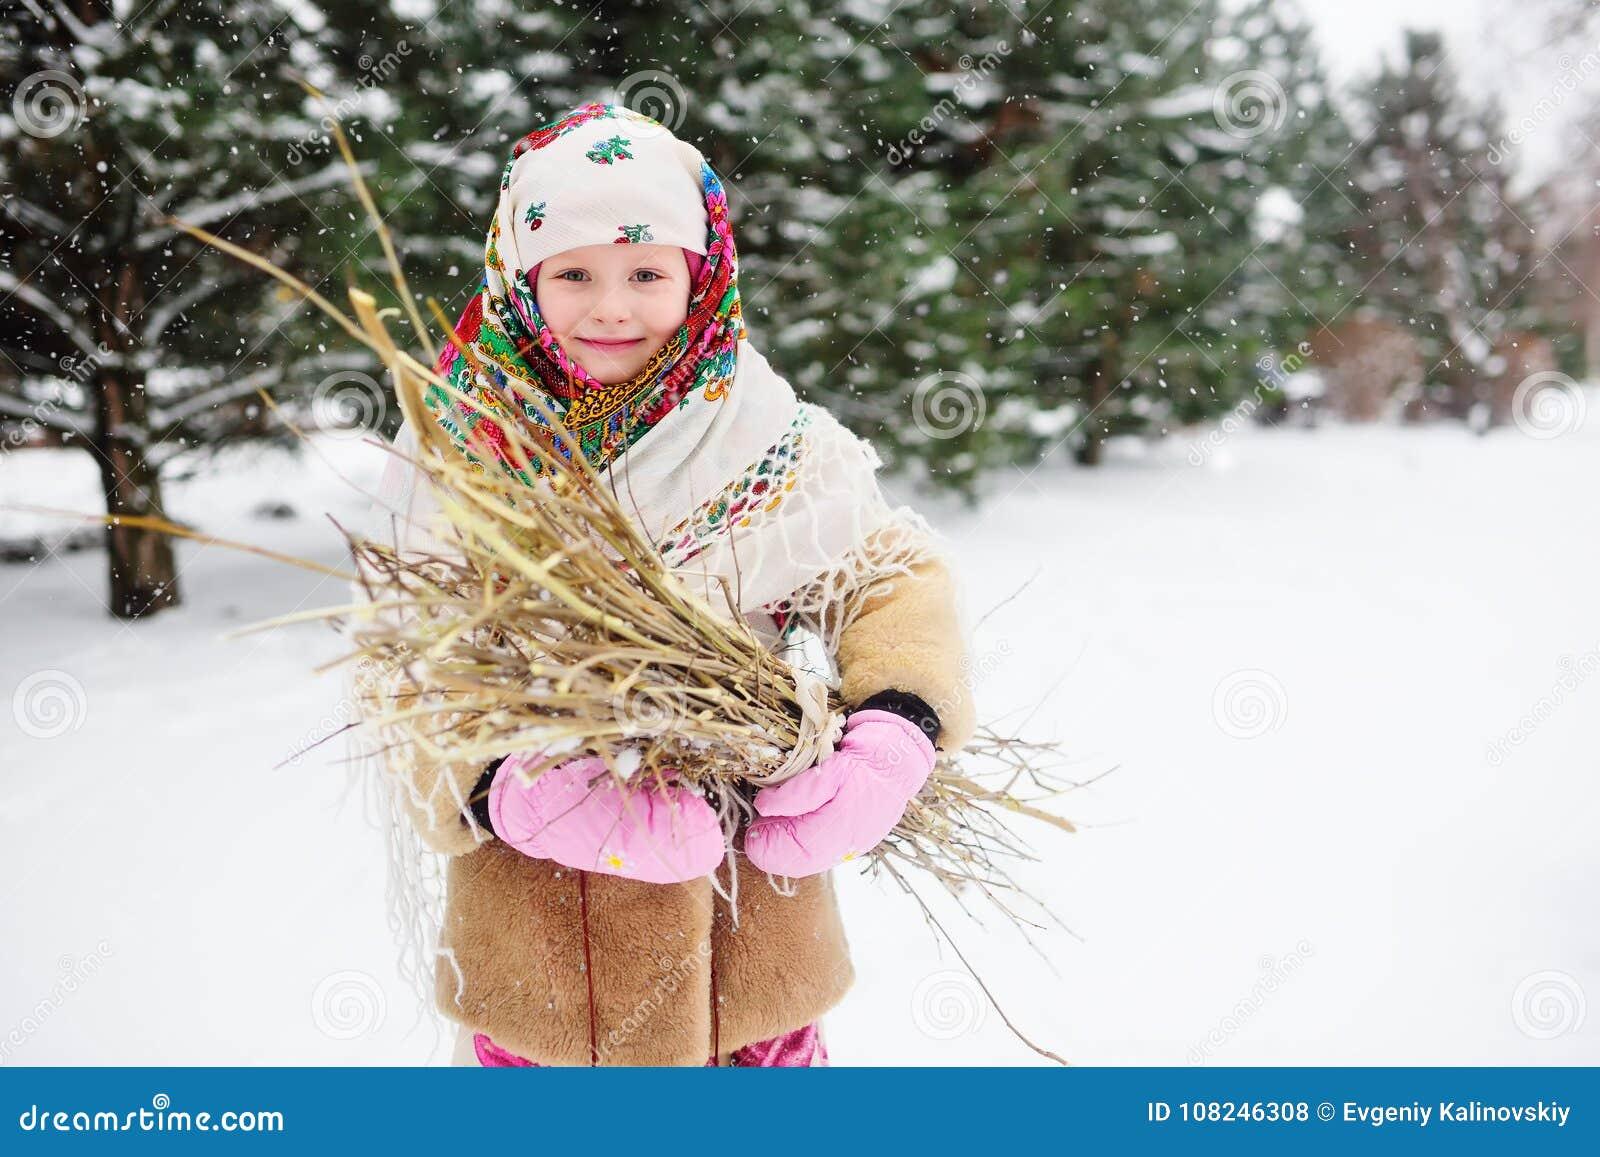 В русском лесу девушки фото — img 10